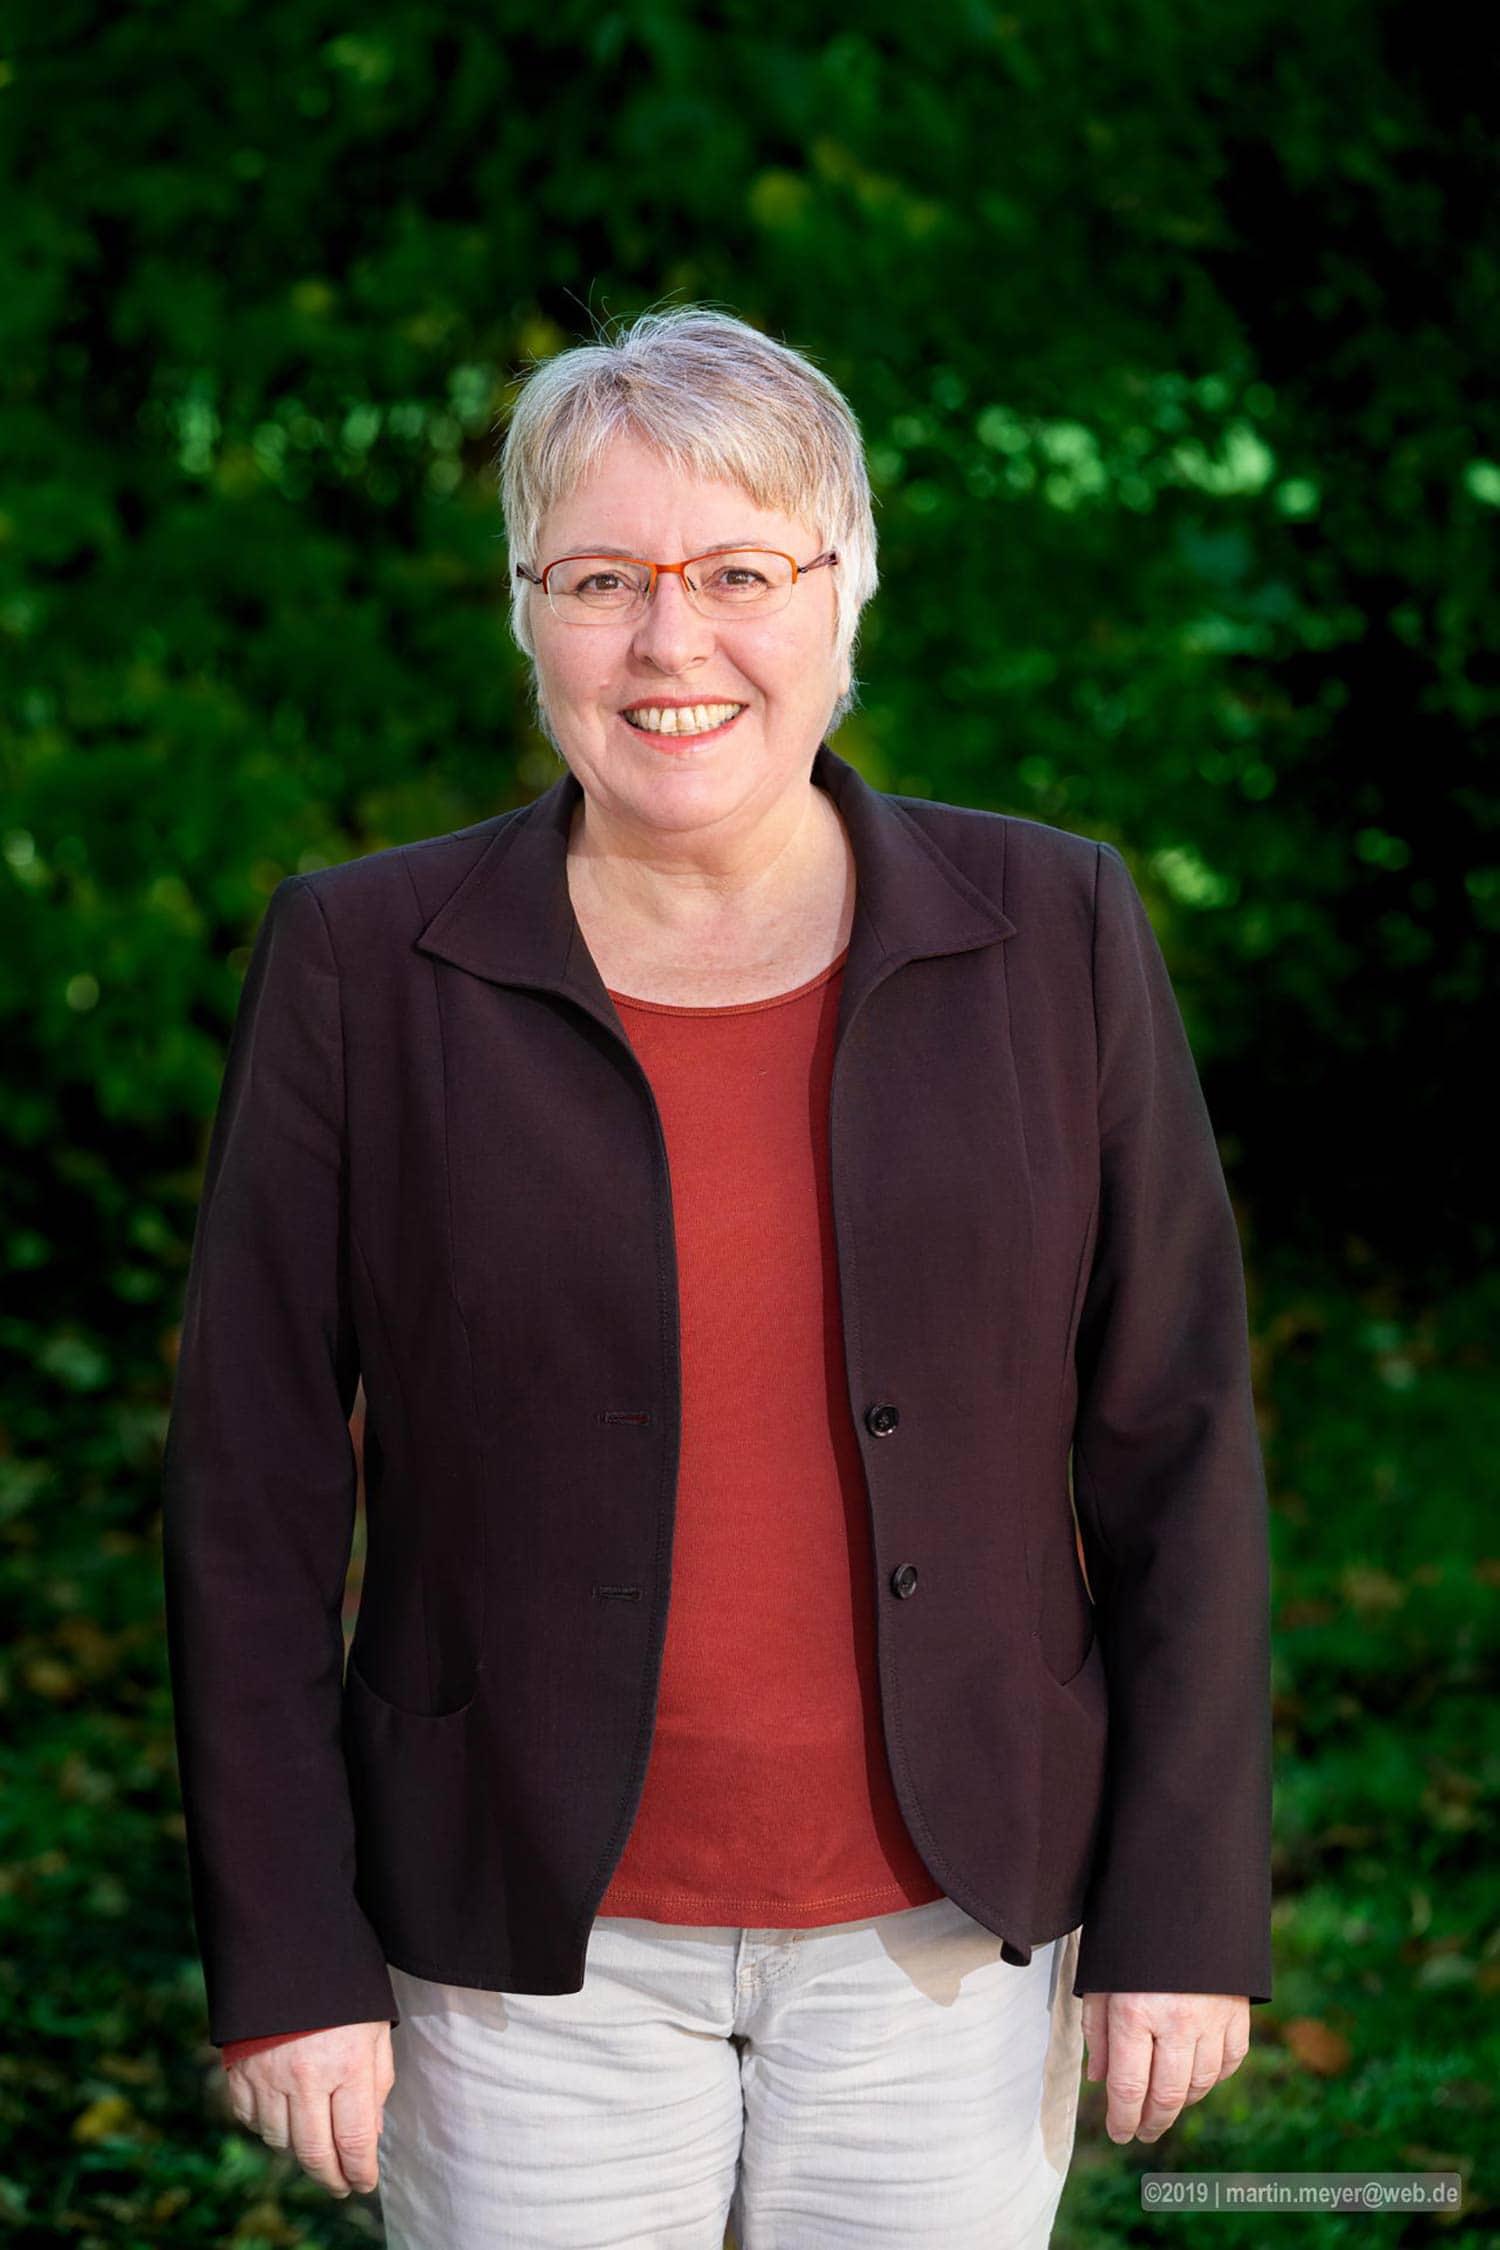 Grüne - Maria Simon (57) Dipl. Sozialpädagogin Fotos: Bündnis 90/Die Grünen